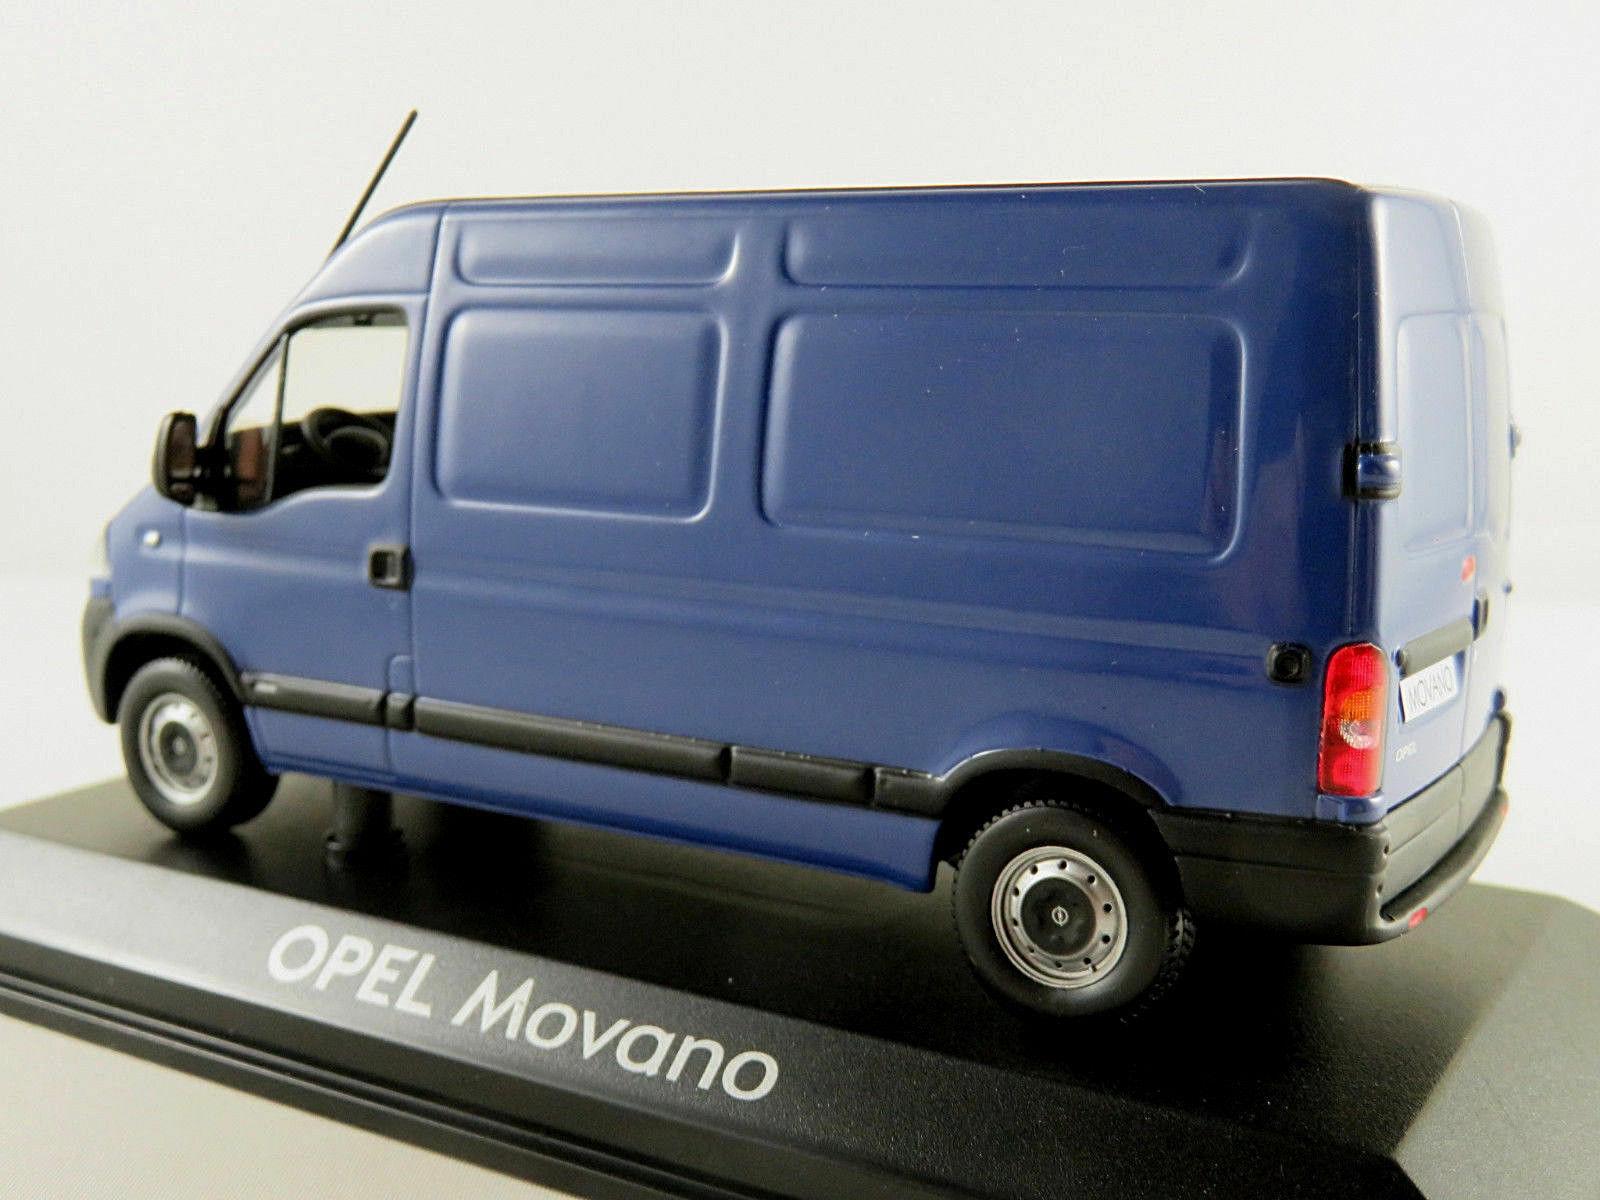 OPEL MOVANO 3500 TOLE 2003 PHASE 2 2 2 blue NOREV 9163272 1 43 UTILITAIRE blue blueE 92e8e0